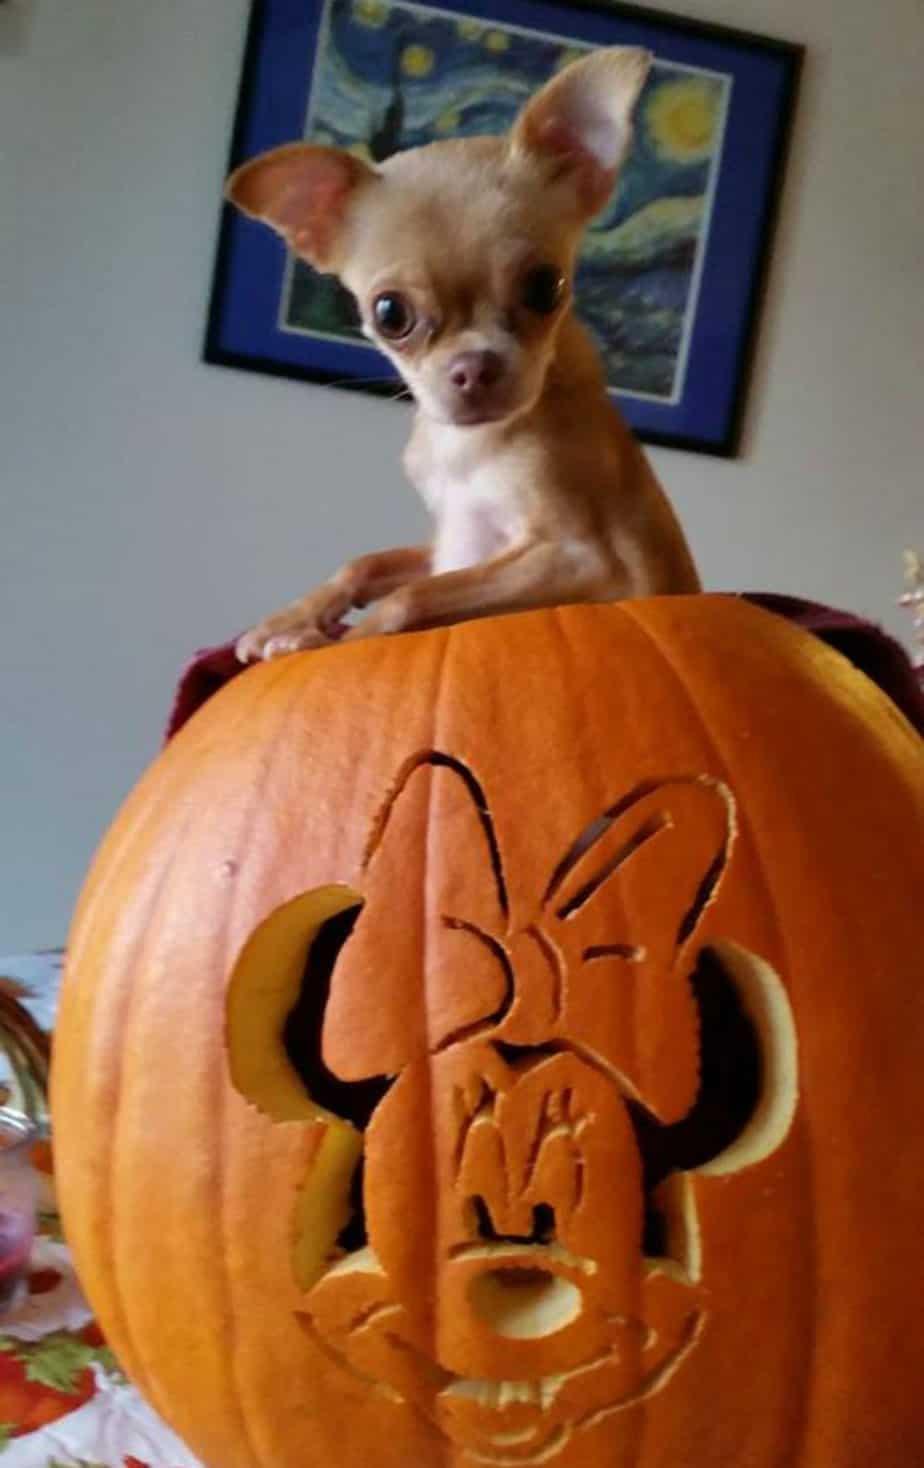 chihuahua in a pumpkin